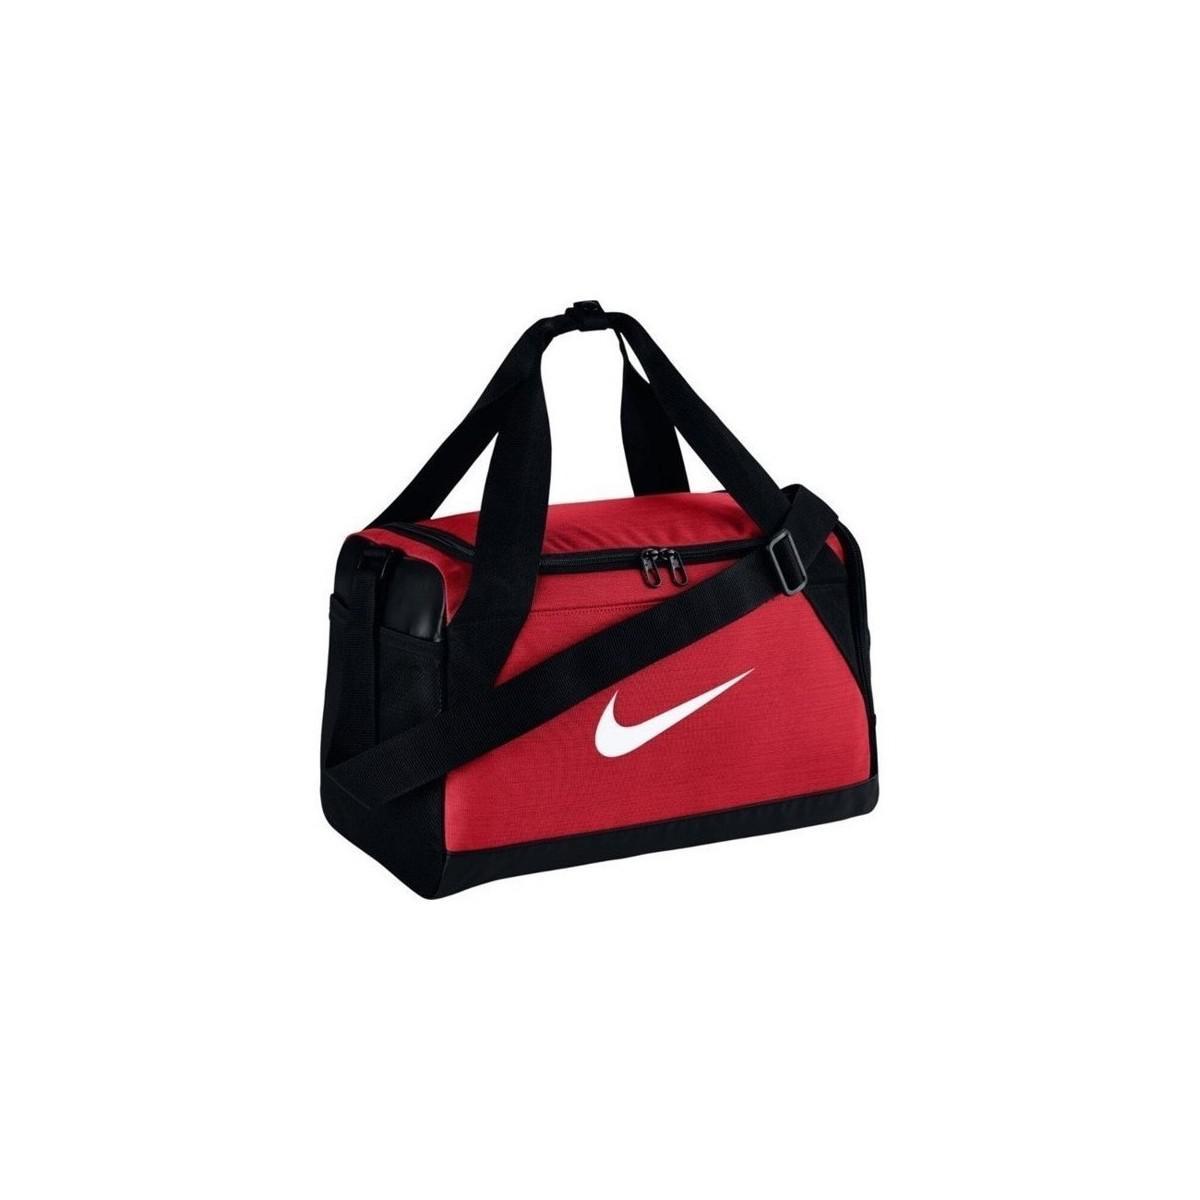 Nike Brasilia 6 Xs Duffel Gym Bag  8d1fb6ad0354d